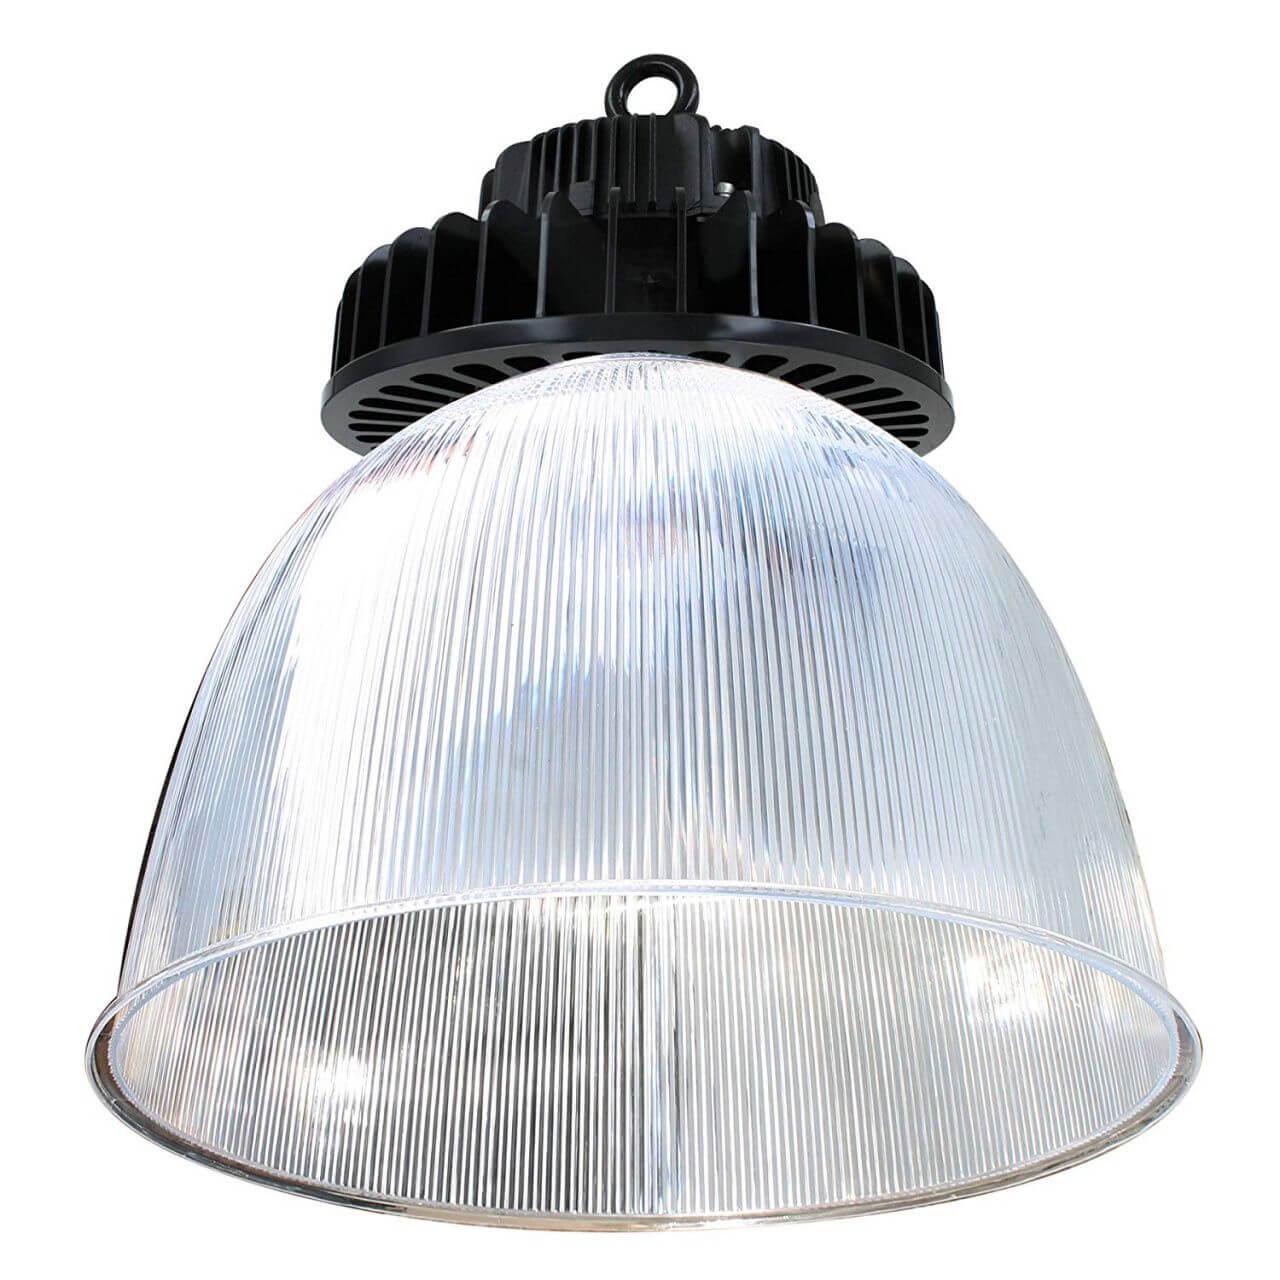 Reflectors in LED High Bay Luminaire